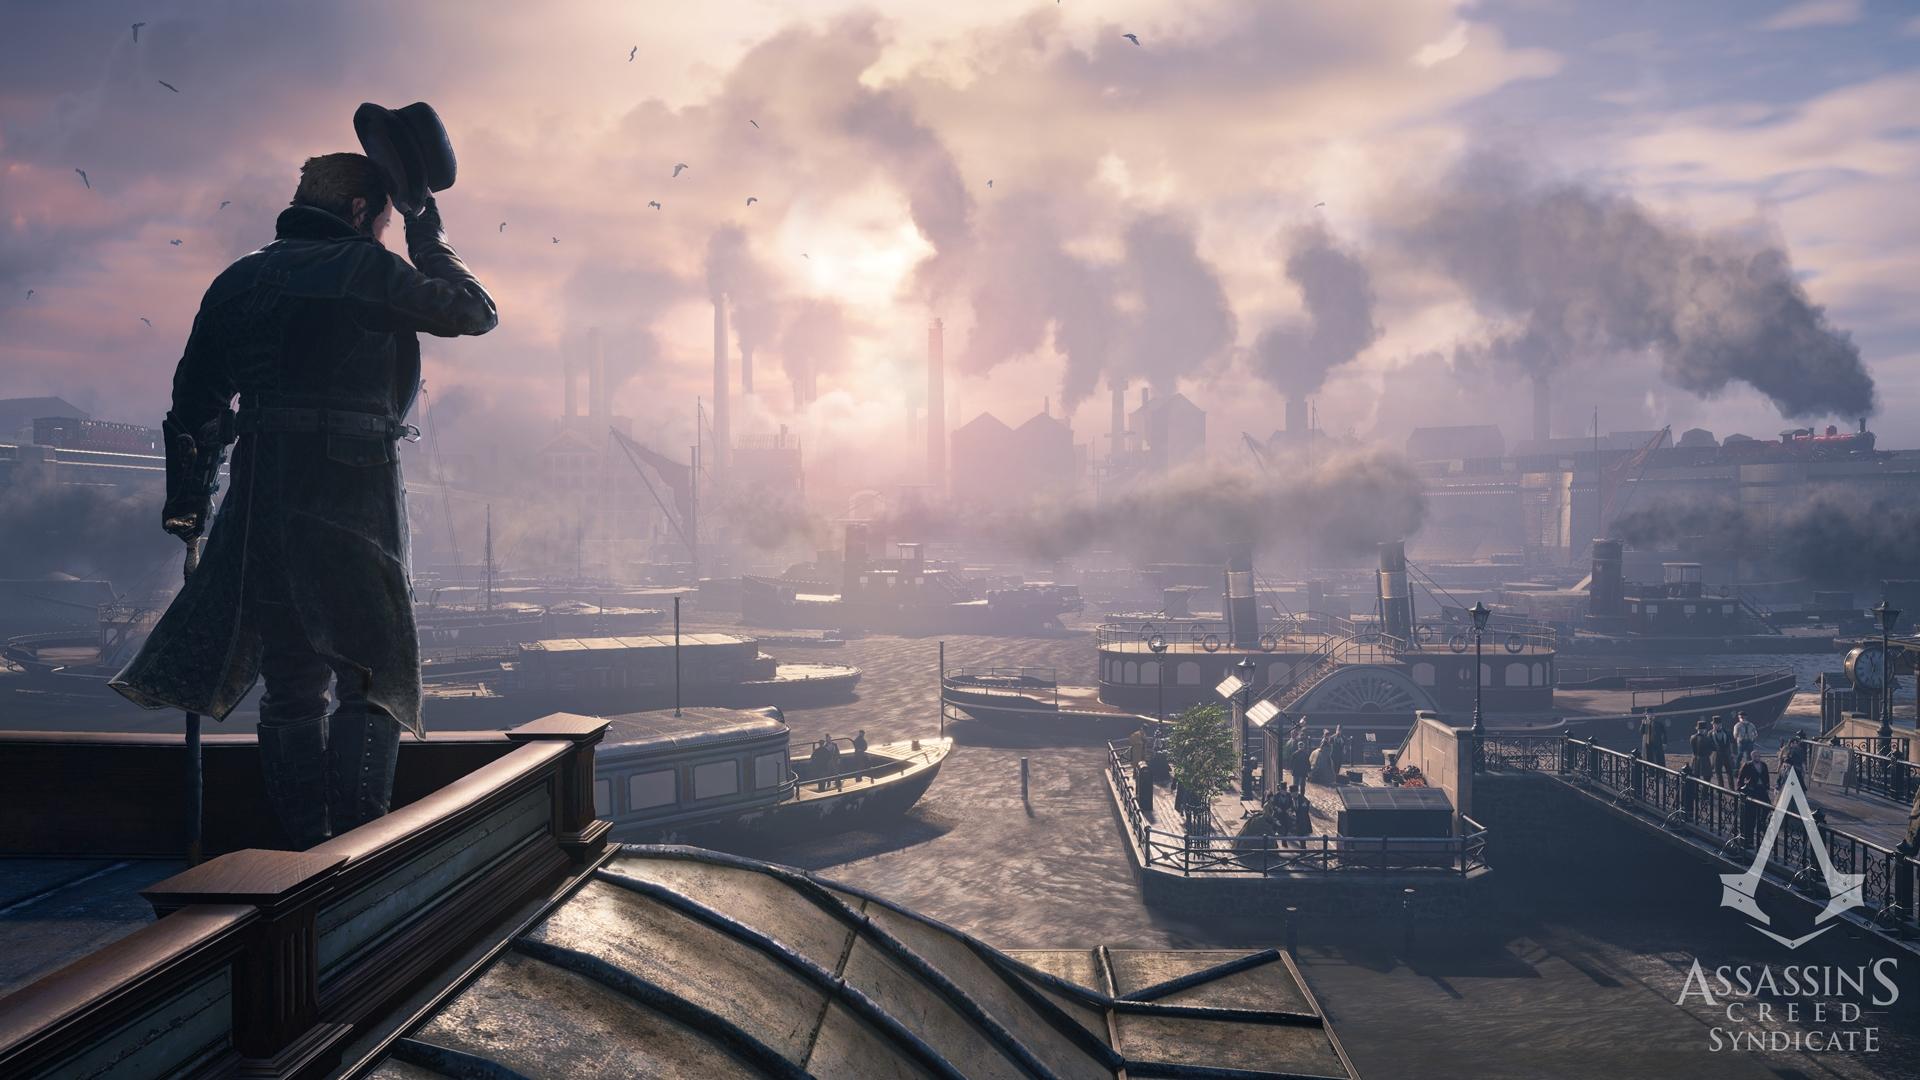 Assassin's Creed: Syndicate — банды Лондона. Из первых рук